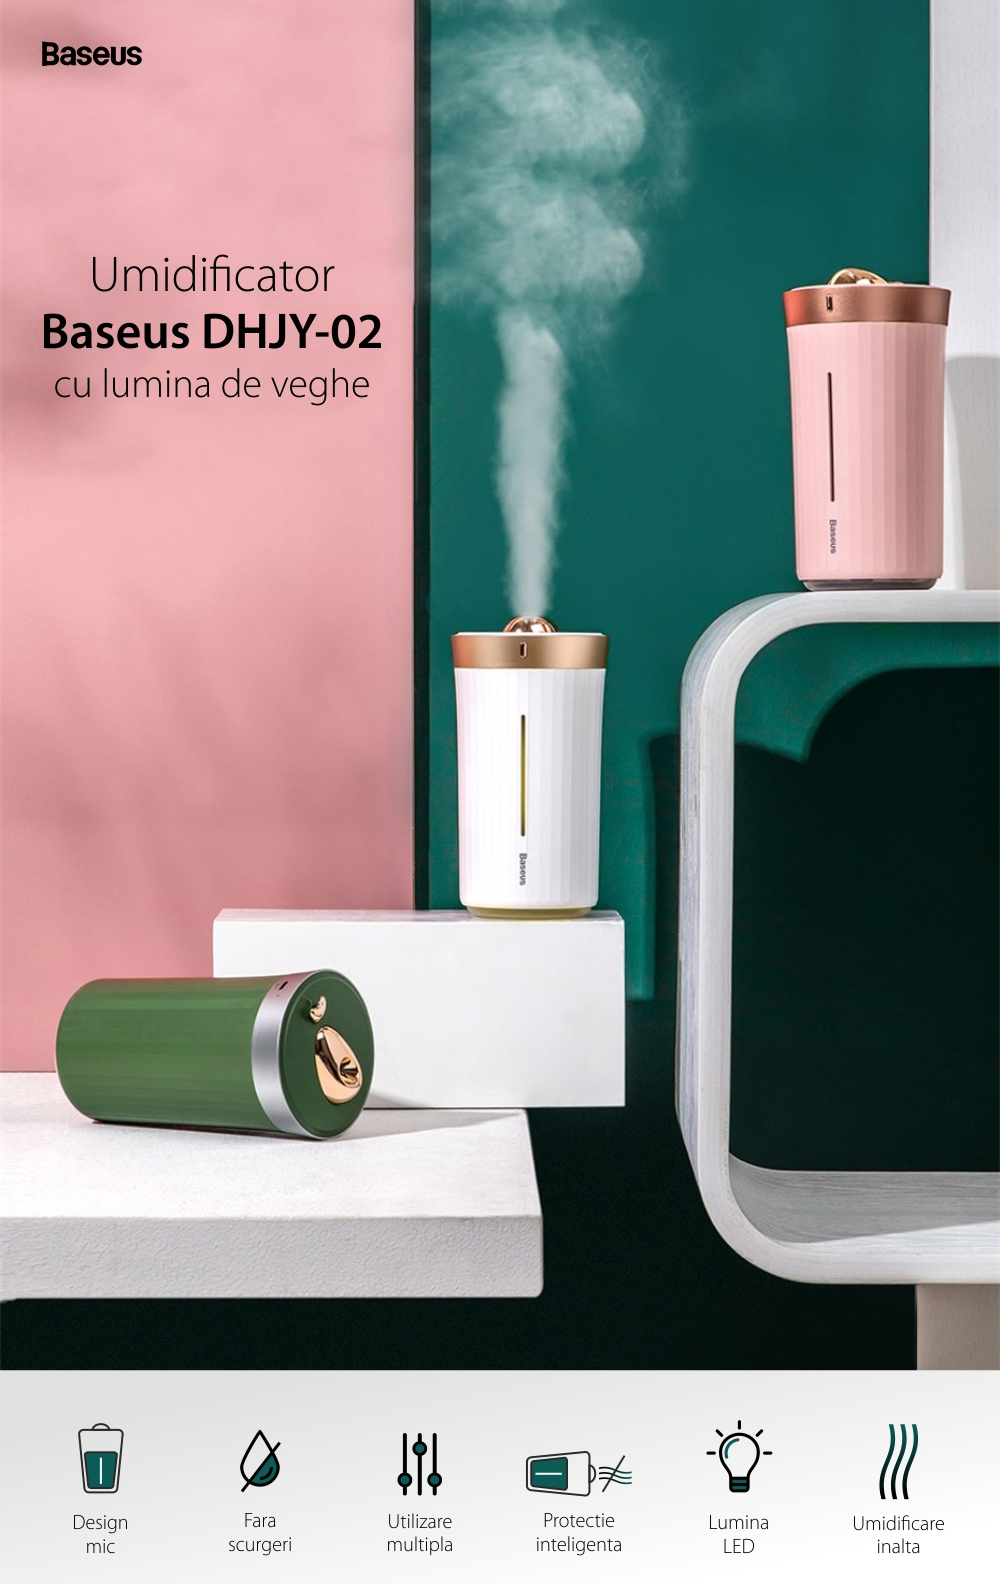 Umidificator cu lumina de veghe Baseus DHJY-02, Pentru masina / casa, Protectie inteligenta, Capacitate 420 mL